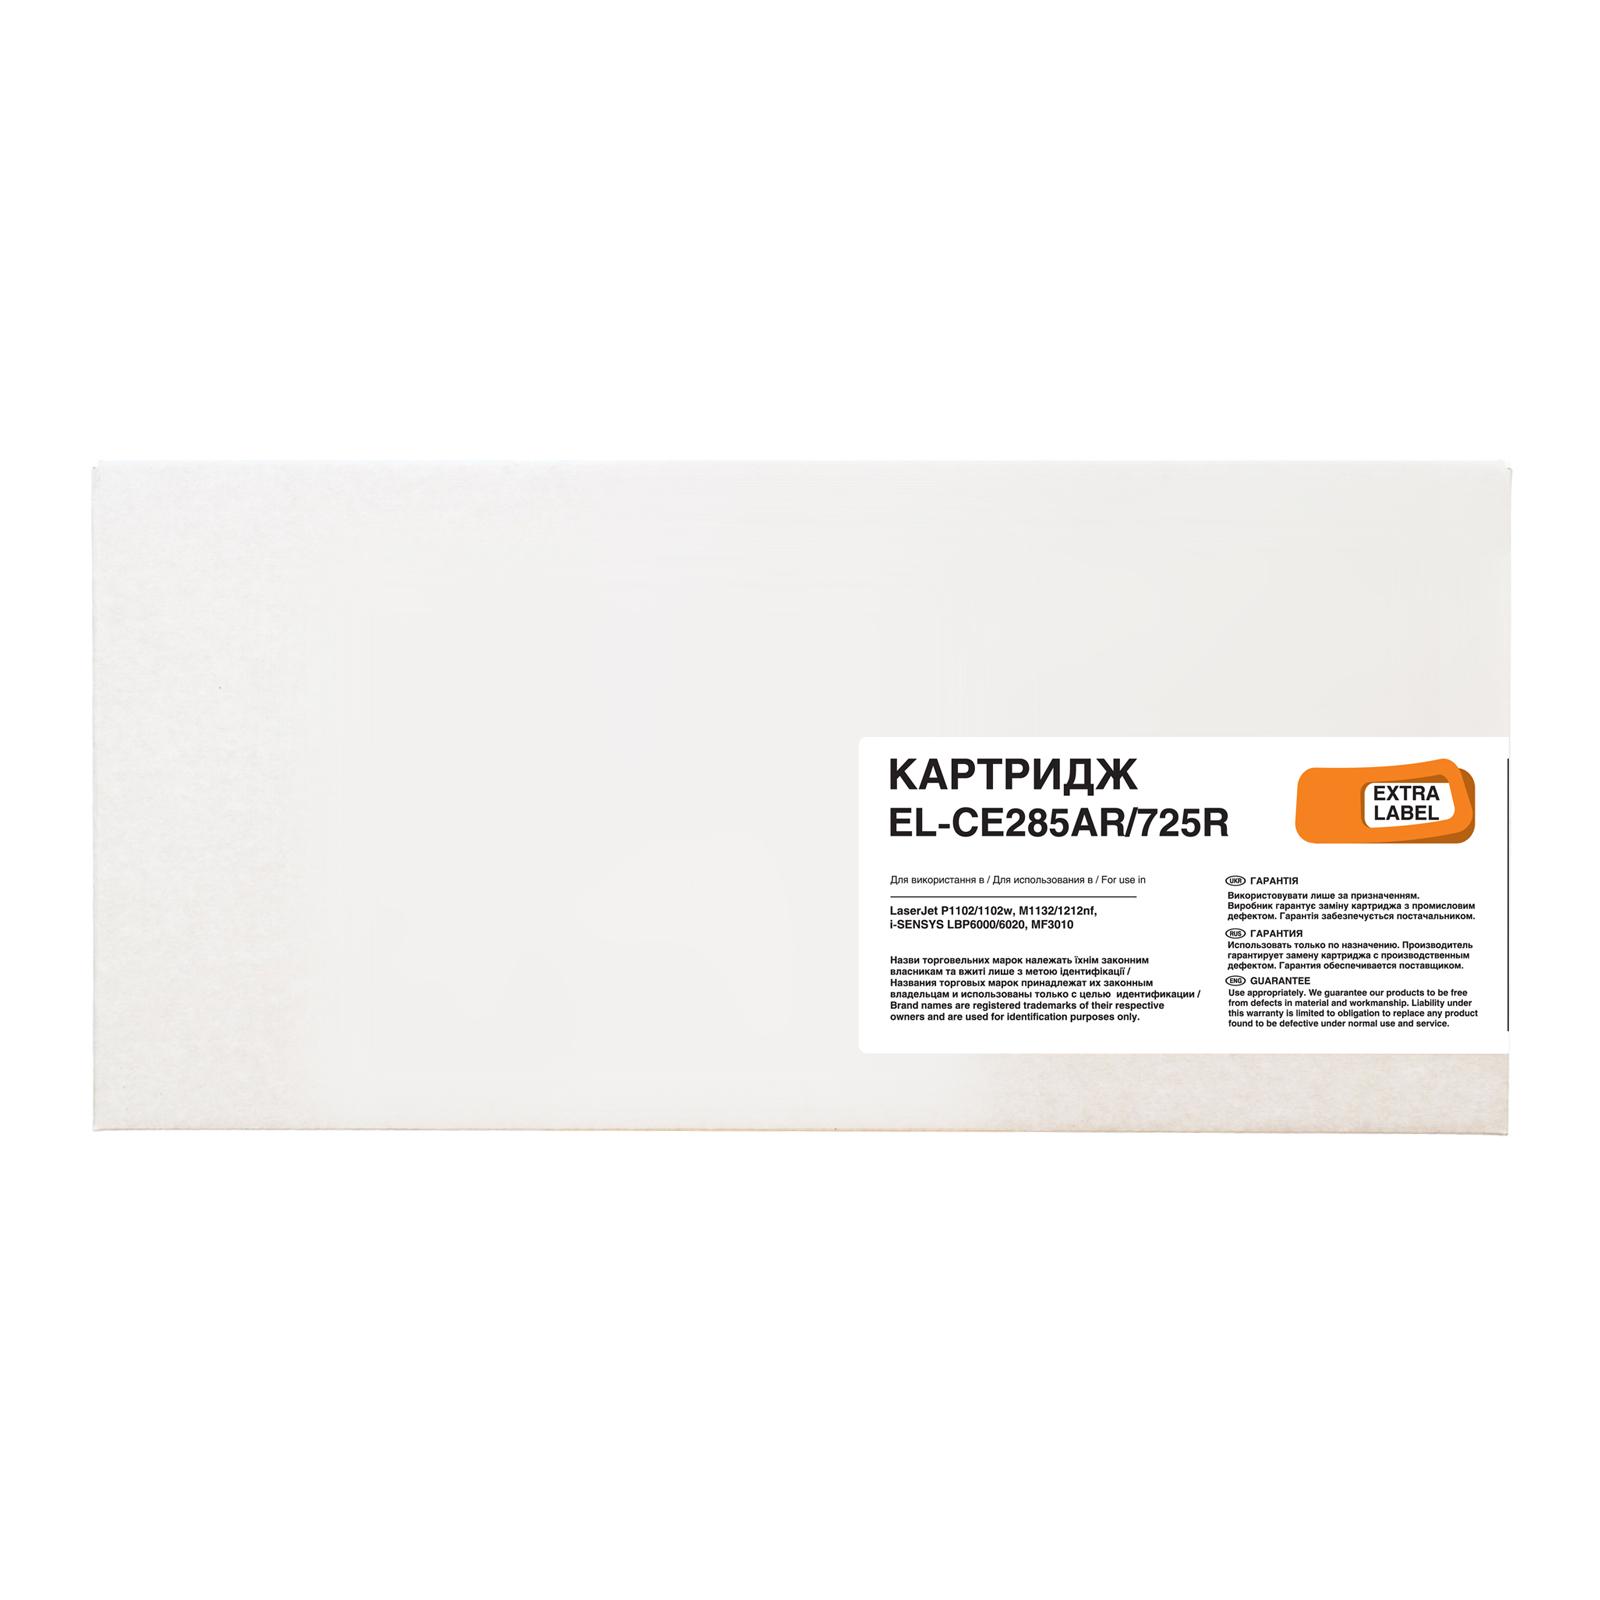 Картридж PATRON HP LJ CE285A/CANON 725 EXTRA Label (EL-CE285AR/725R) изображение 2